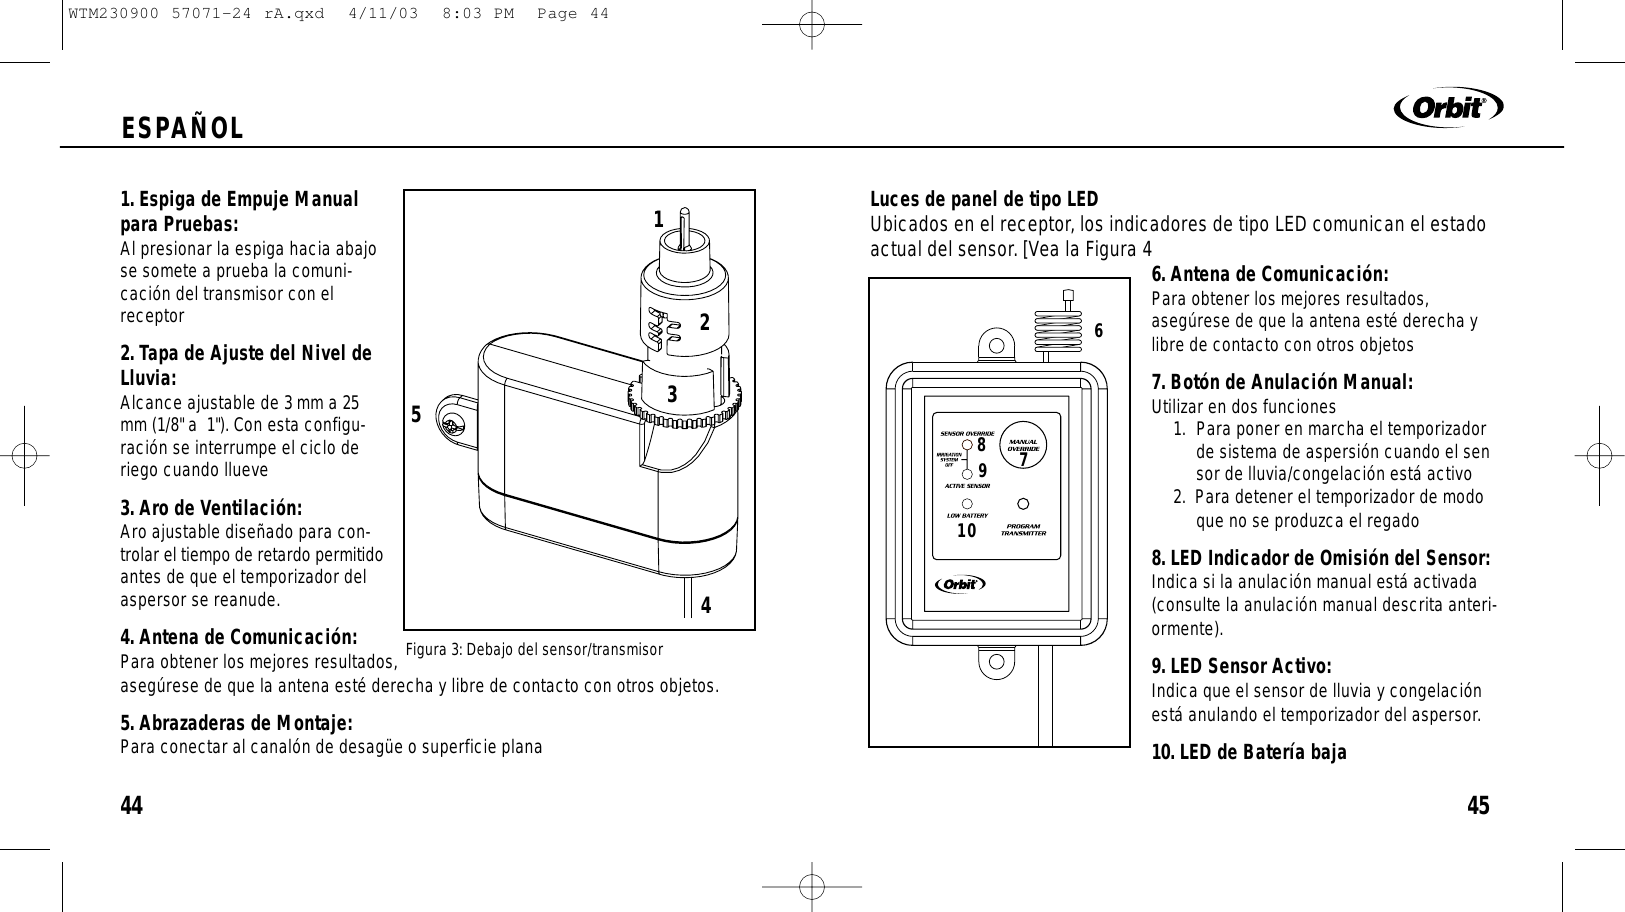 Orbit Irrigation Product Rx2 Rf Rain Sensor And Freeze Tx Controller Wiring Diagram 45espaol441 Espiga De Empuje Manualpara Pruebas Al Presionar La Hacia Abajose Somete A